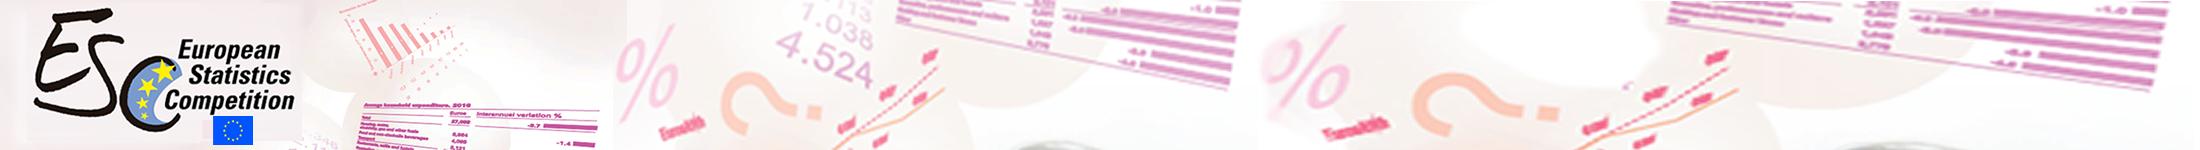 testata european statistics competition